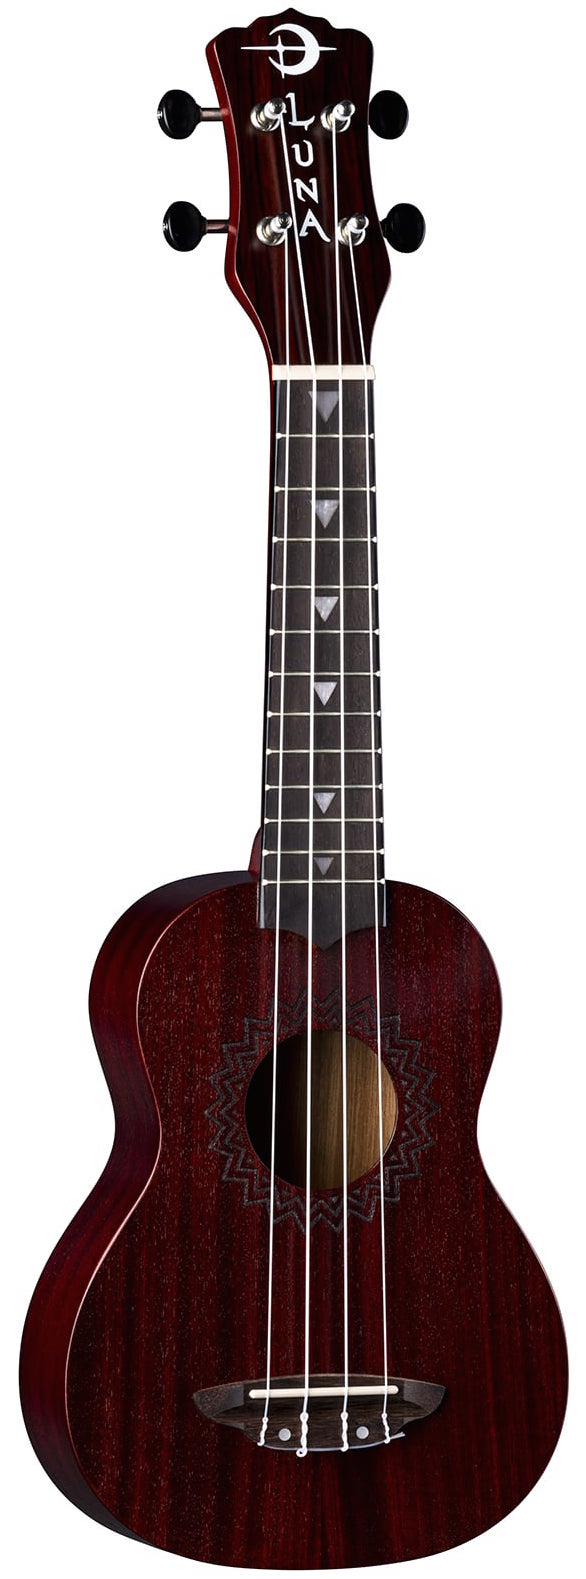 Luna Guitars UKE VMS RDS Vintage Mahogany Soprano Ukulele - Satin Red